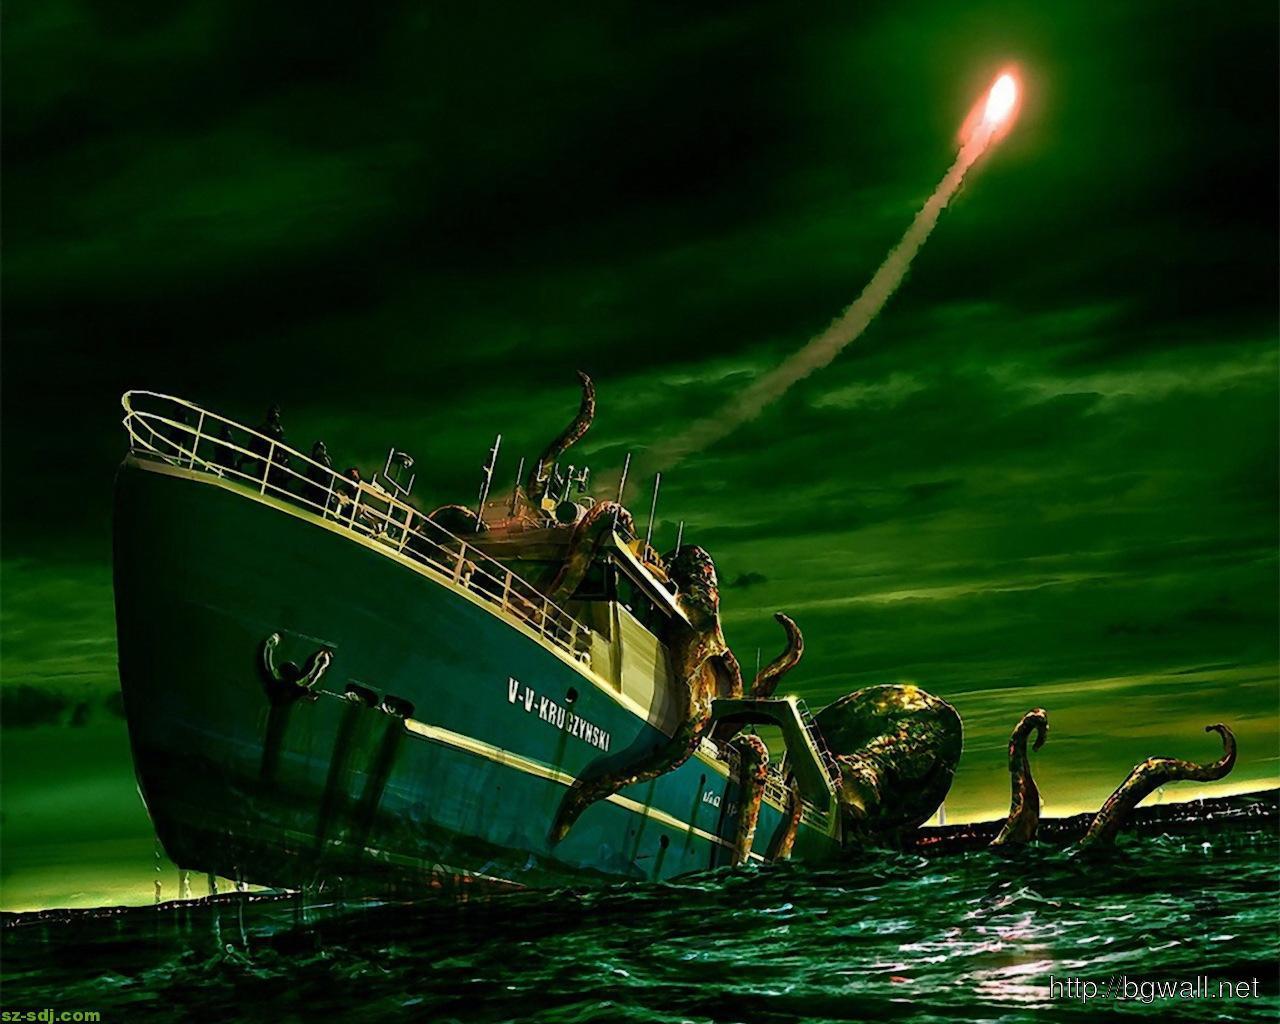 S4 Car Wallpaper Giant Kraken Attacking Ship Wallpaper Background Hd